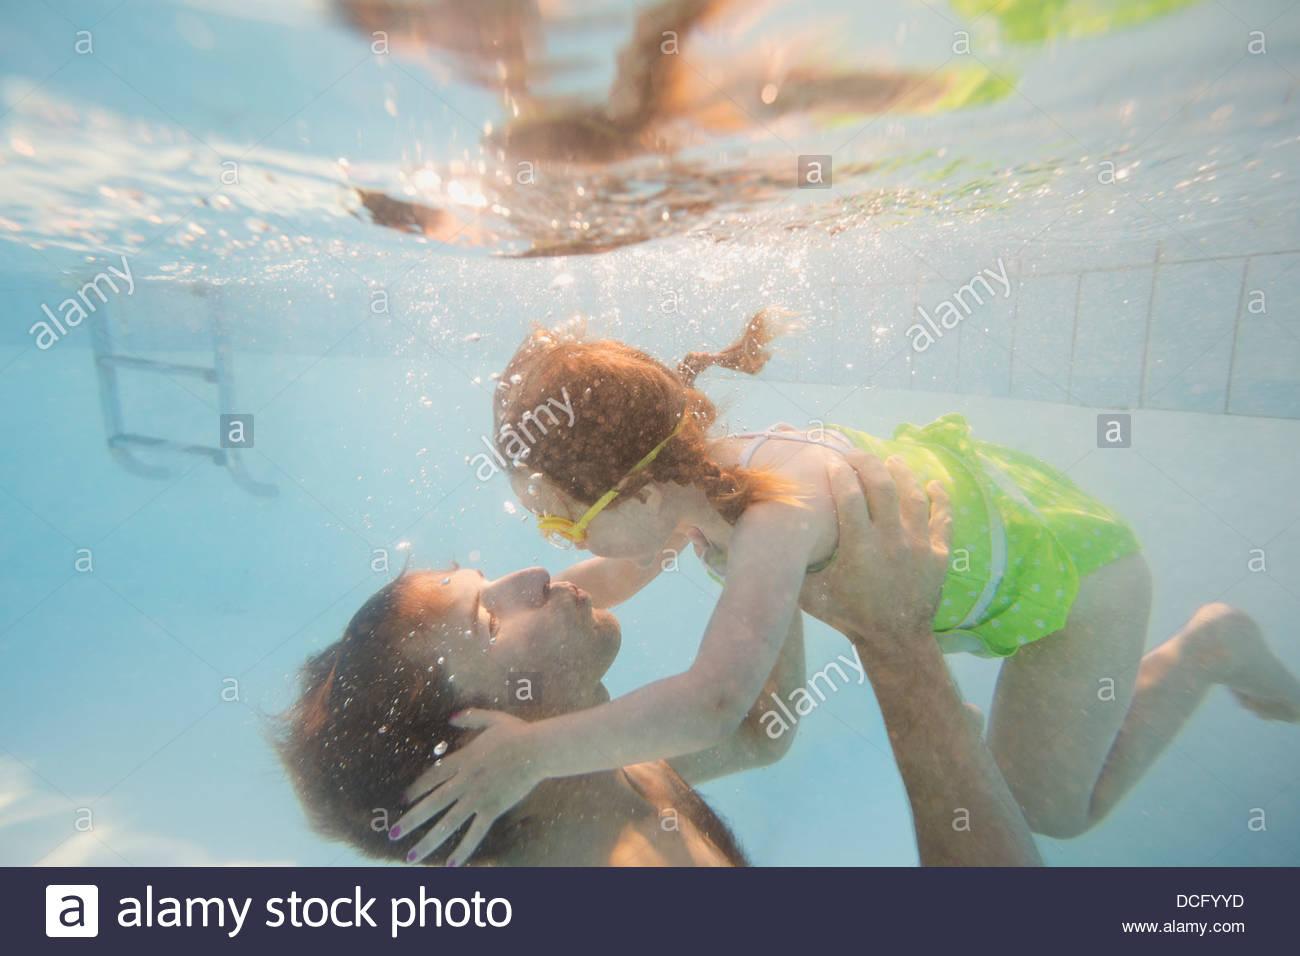 Padre e hija bajo el agua en la piscina Imagen De Stock